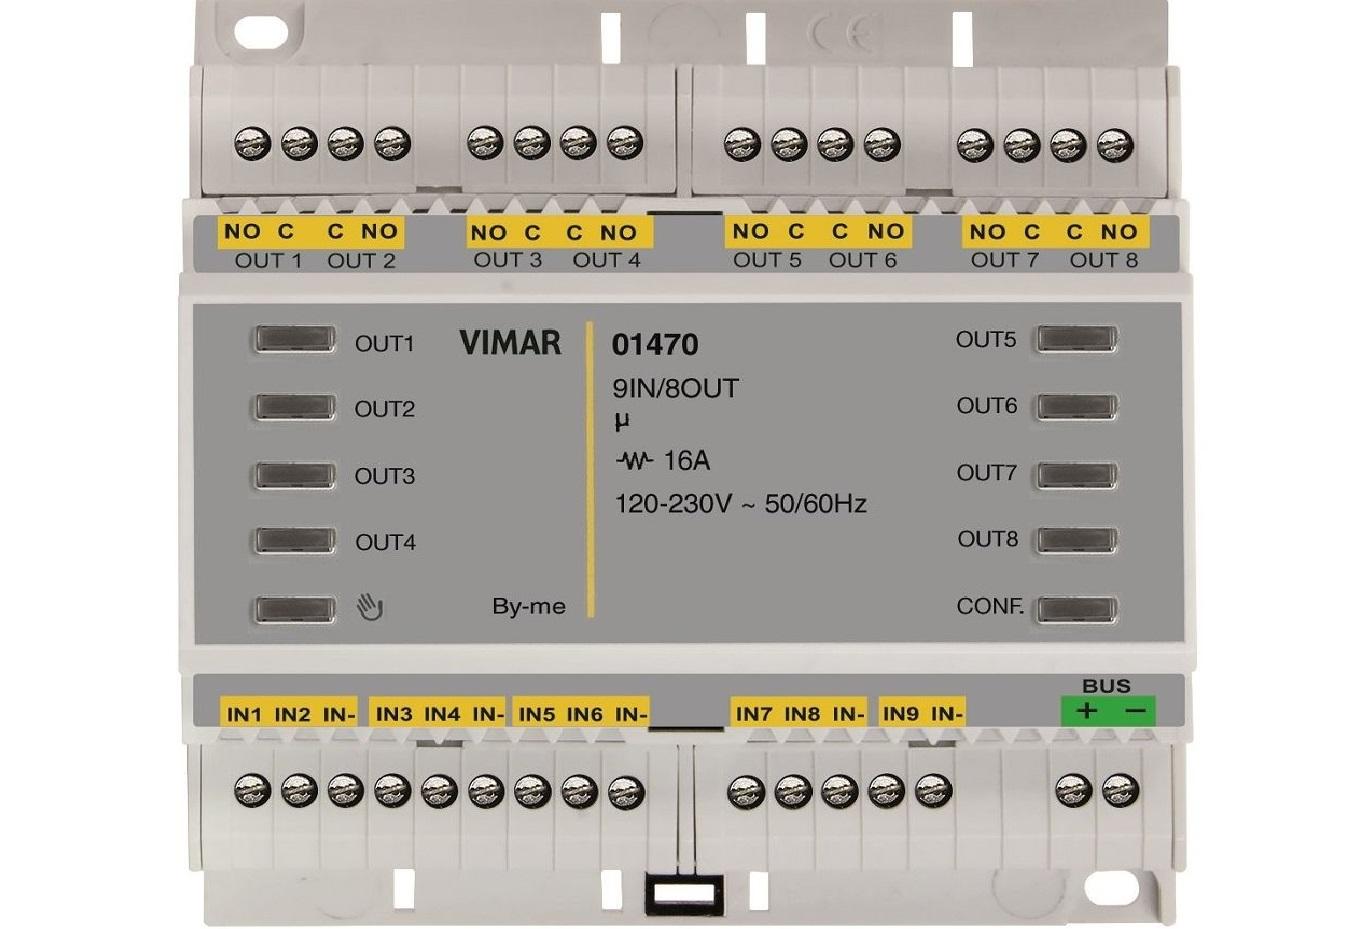 Schemi Elettrici Hormann : Domotica plug&play: dispositivi preconfigurati per un impianto